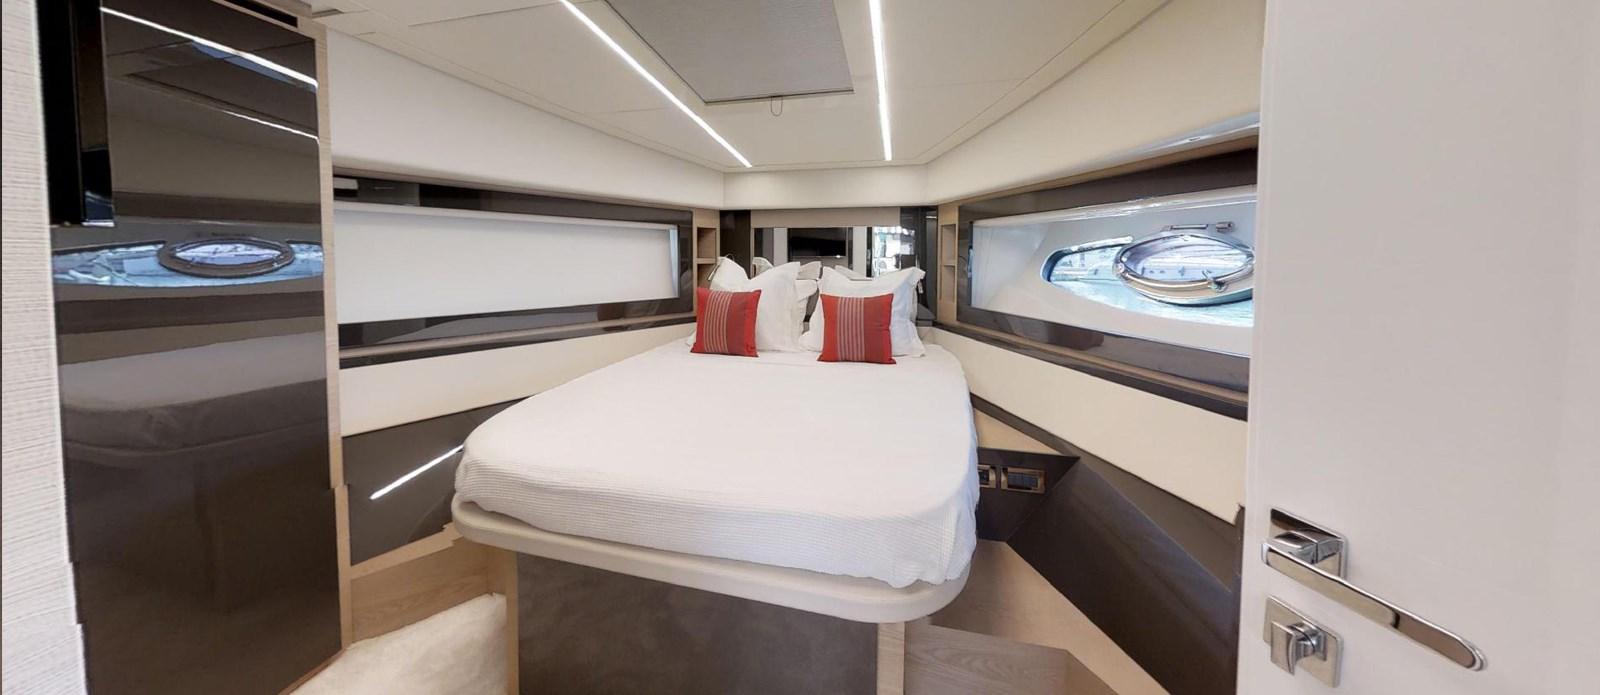 Forward-VIP-Cabin 2015 PERSHING 70 Motor Yacht 2683603